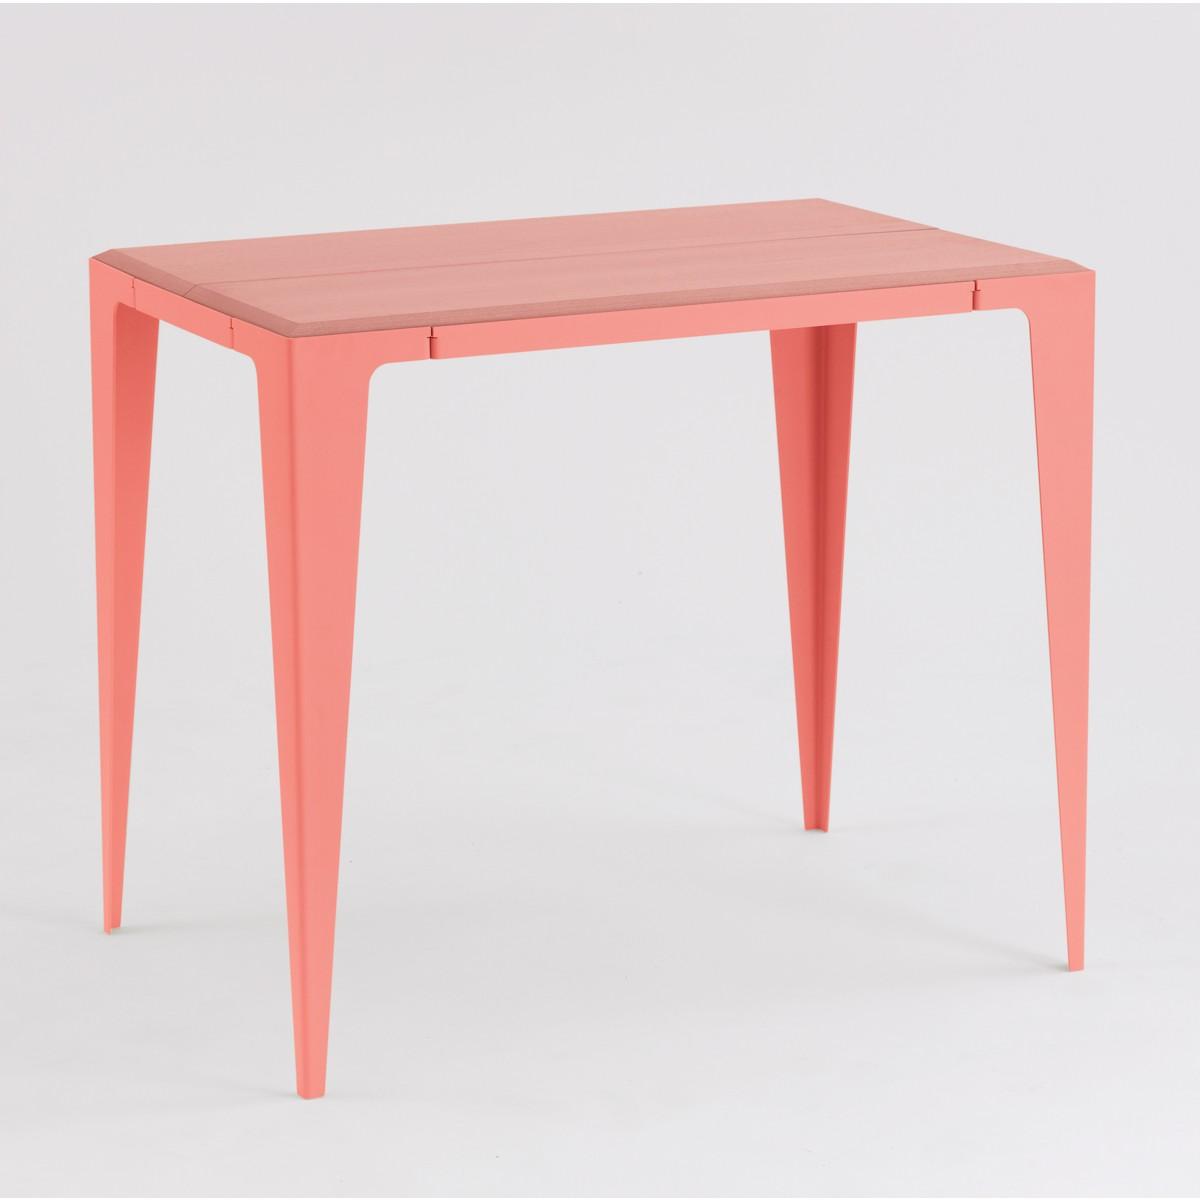 GUERIDON TISCH CHAMFER kalypso-rot *EXKLUSIVE KOLLEKTION*   nachhaltiges Möbeldesign   WYE